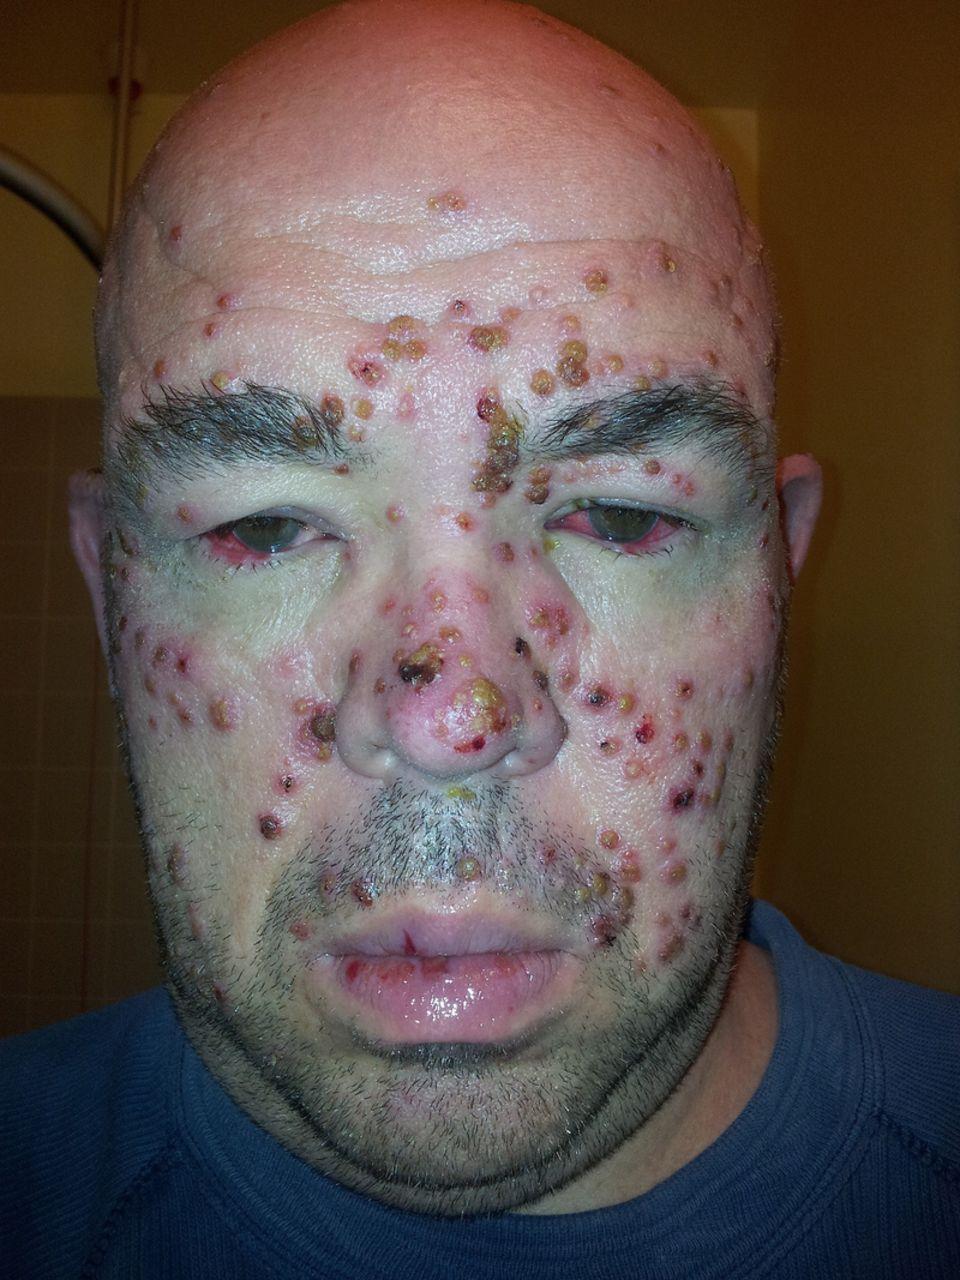 Recurrent Presumed Herpes Simplex Keratitis And Episcleritis In Keratosis Follicularis  Darier U0026 39 S